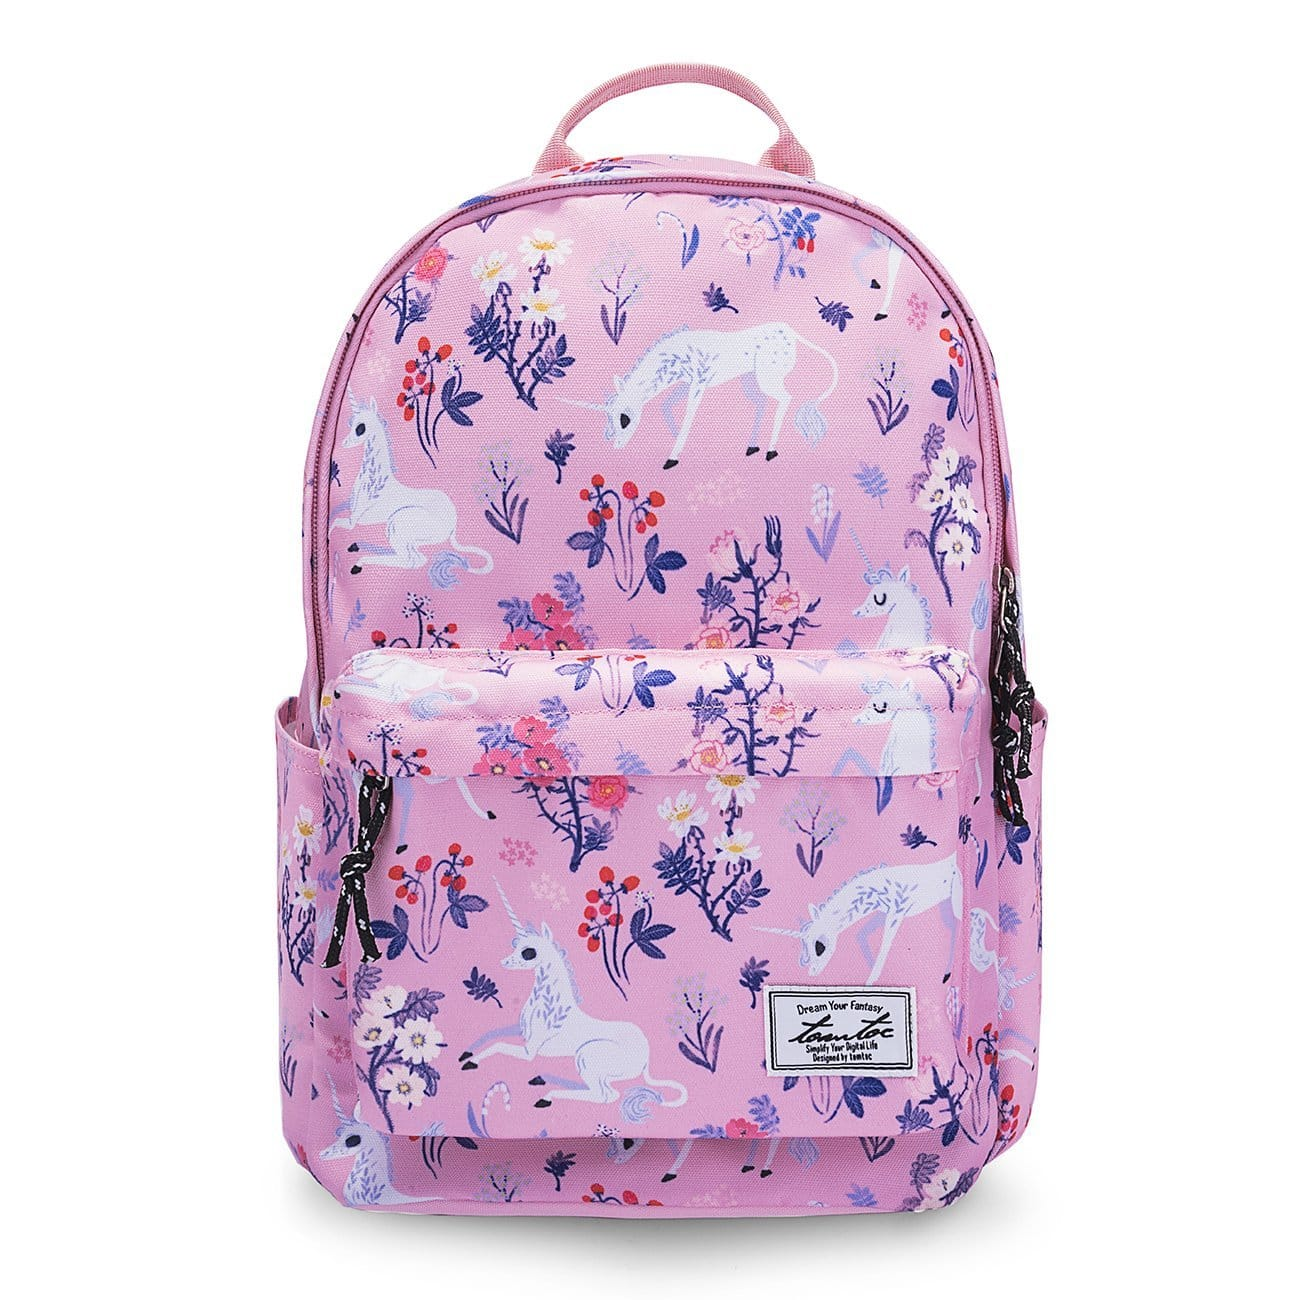 Tomtoc Laptop Backpack Computer Bag Daypack Travel Bag School Bookbags Weekend Bag $19.97-$21.45 AC